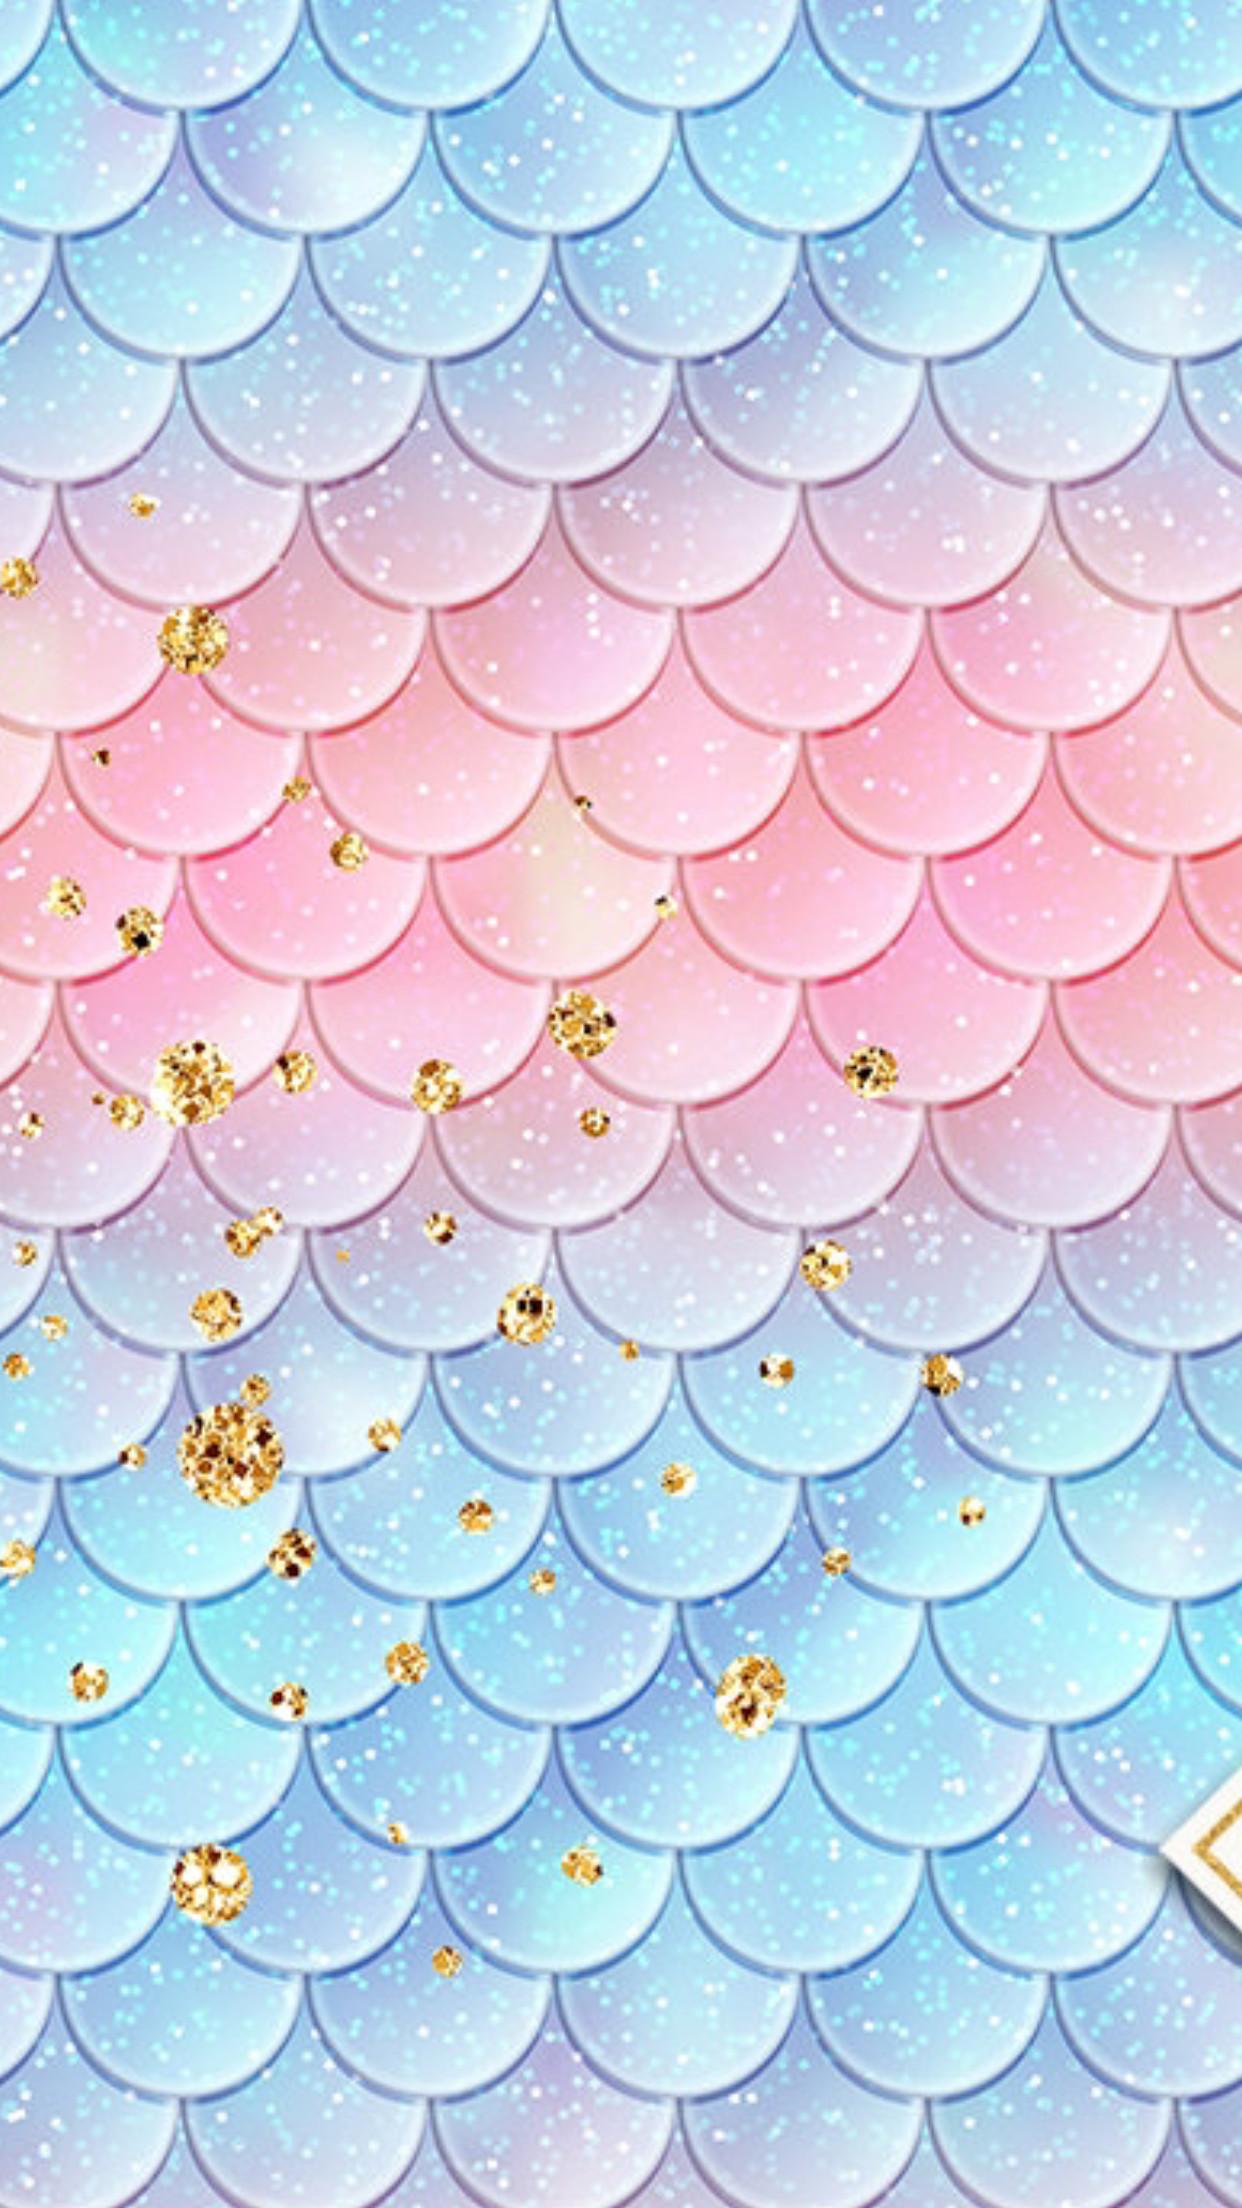 Iphone Wallpaper Mermaid Scales 2247076 Hd Wallpaper